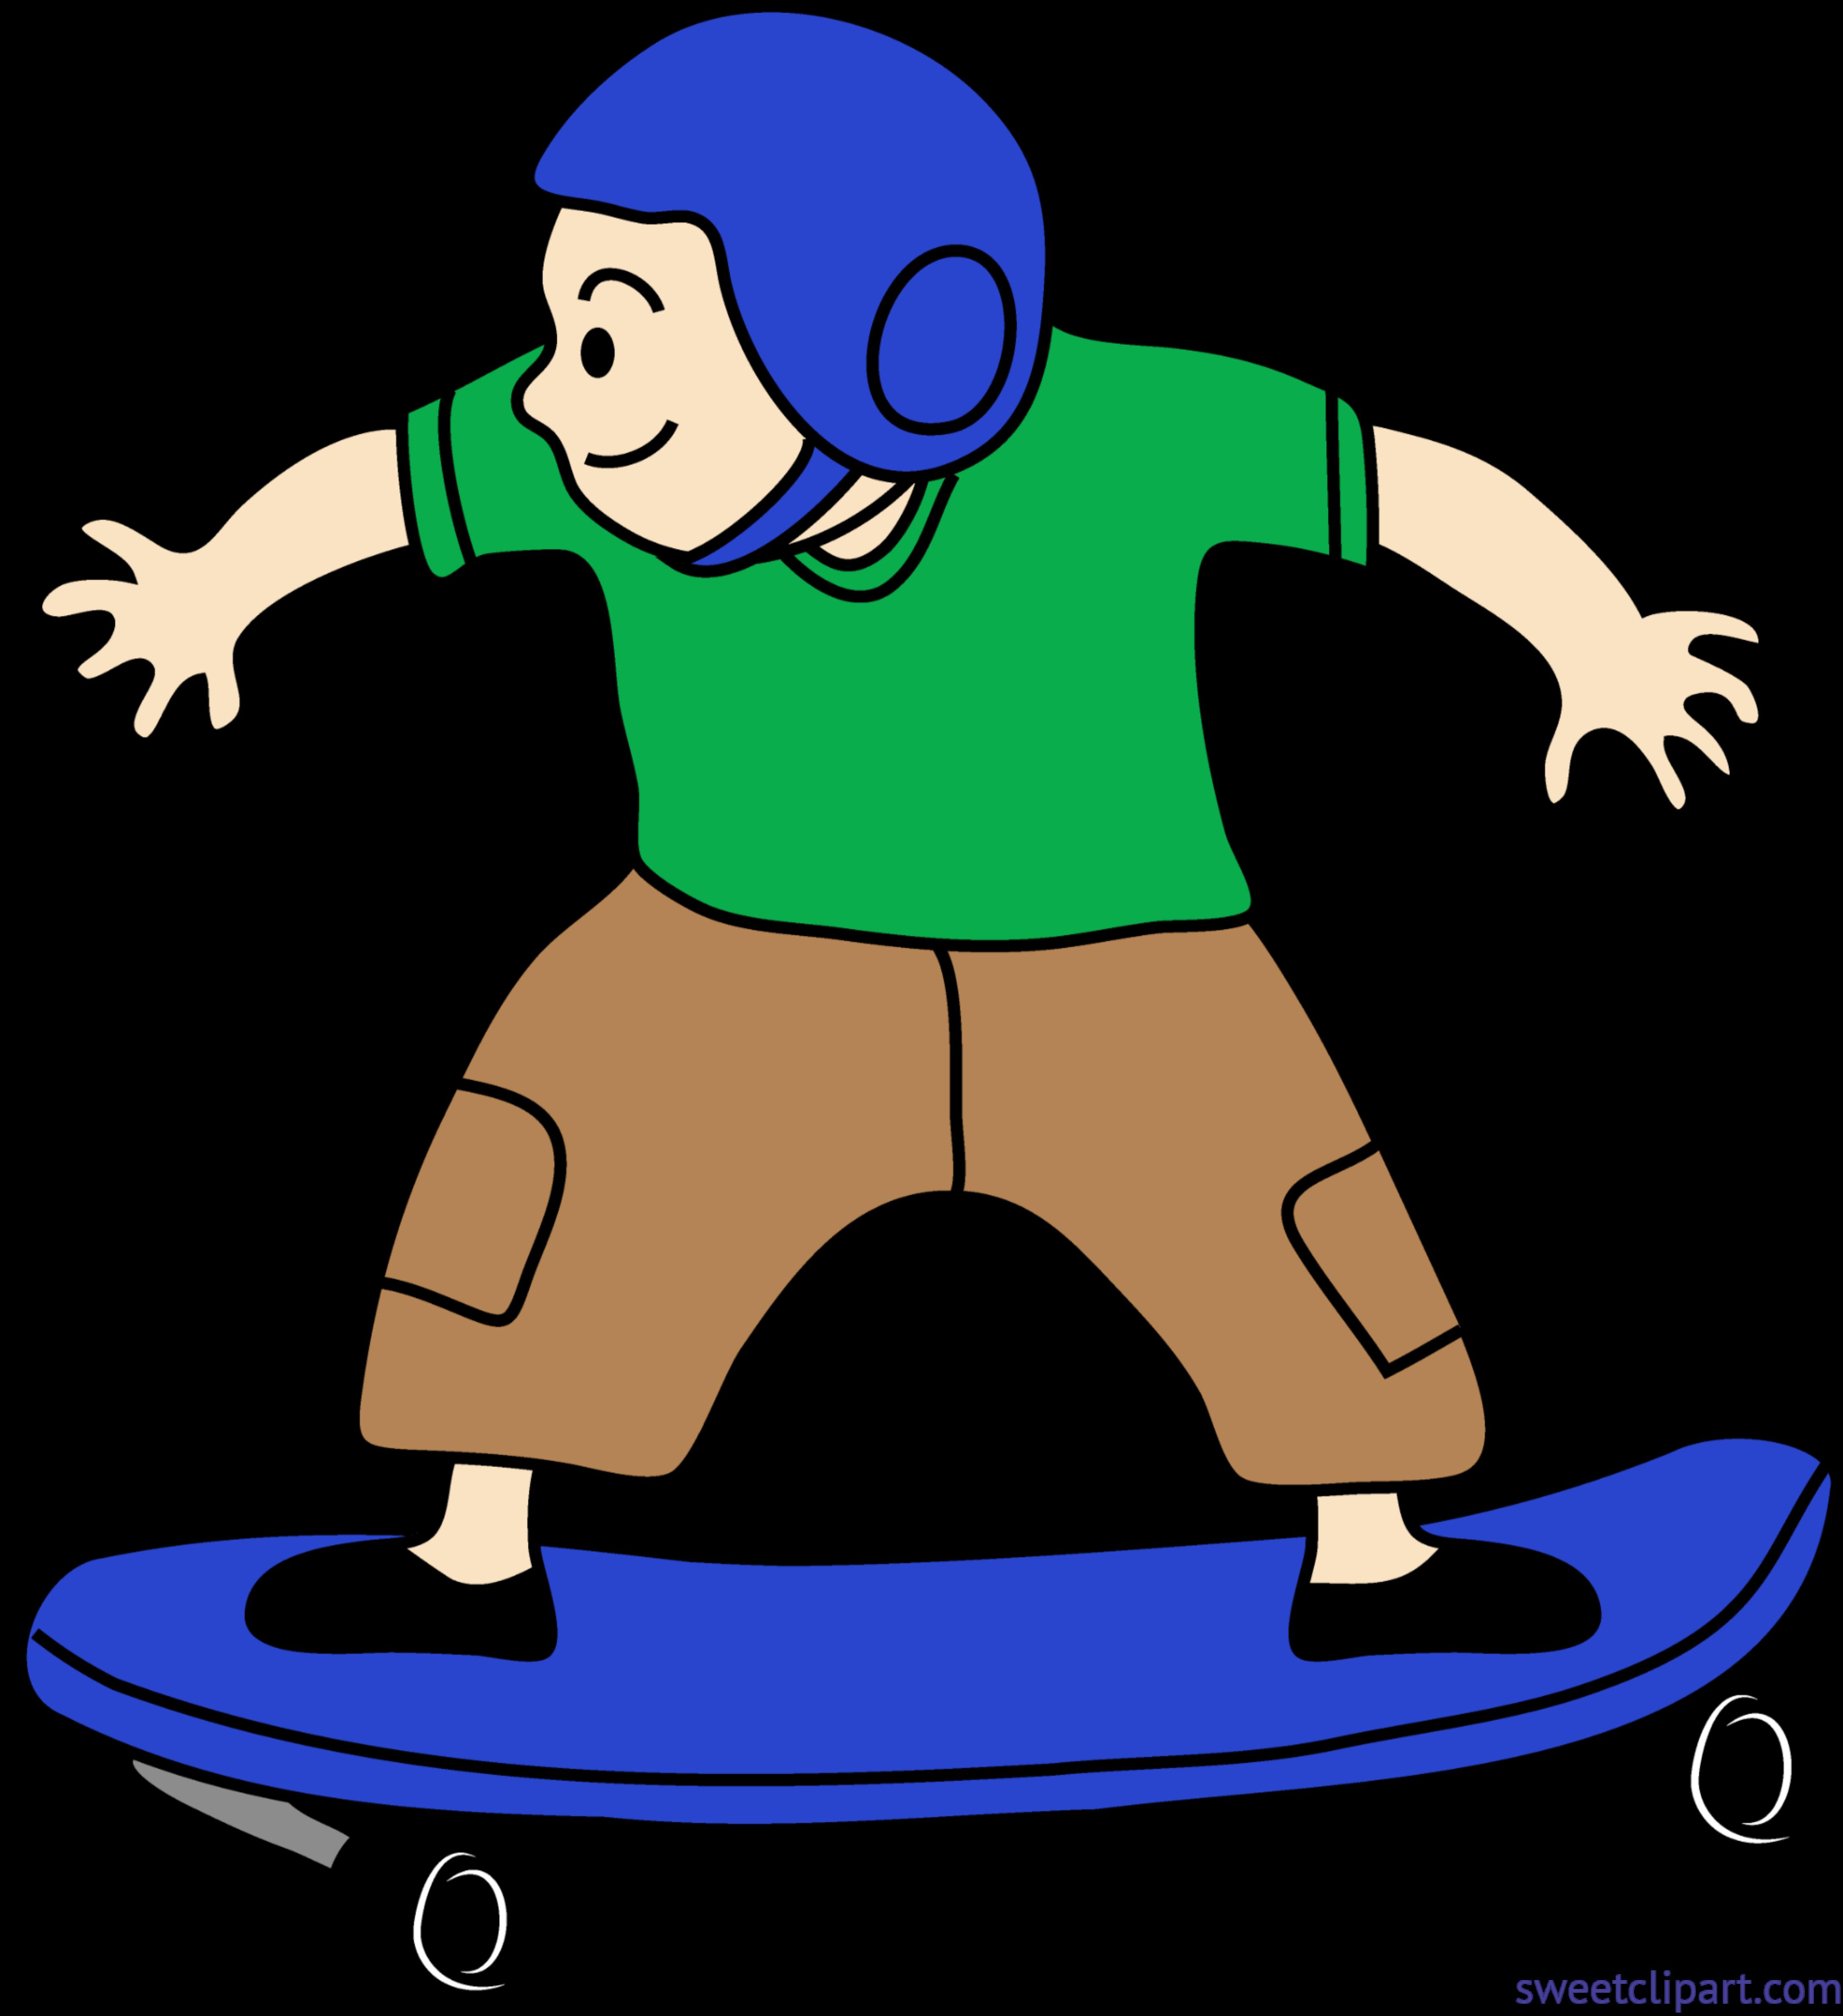 Green clipart skateboard. Skateboarding kid clip art